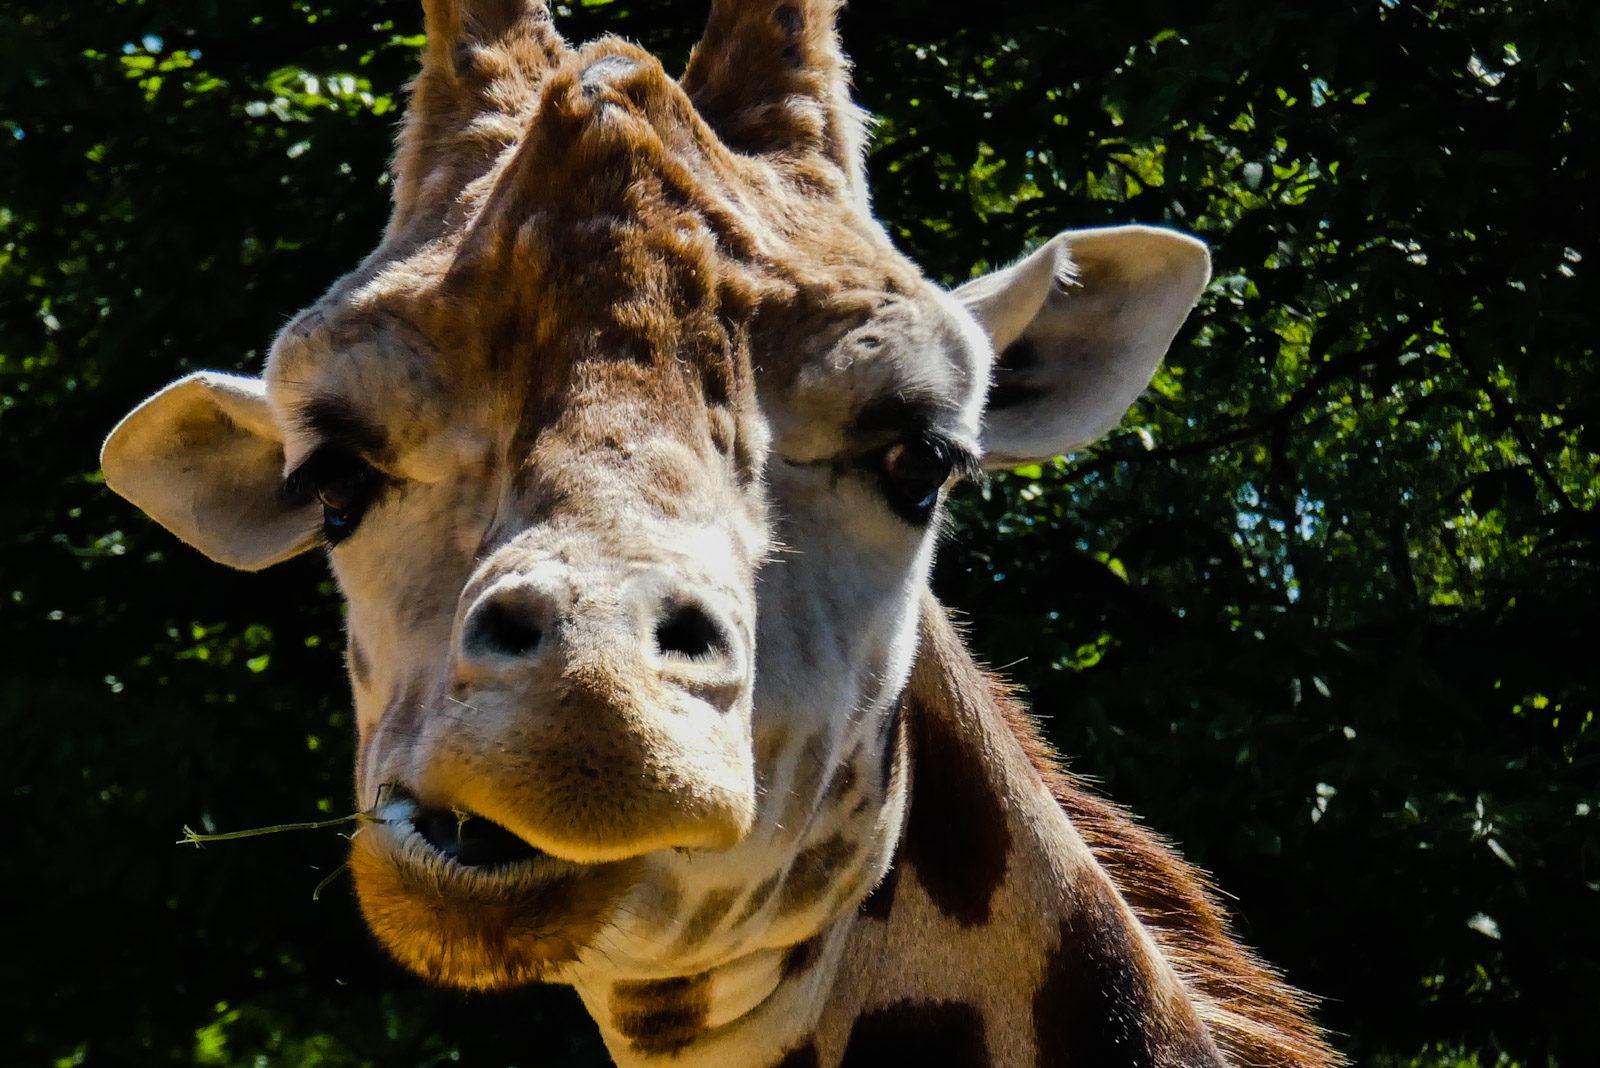 Giraffe in Ouwehands Dierenpark Rhenen